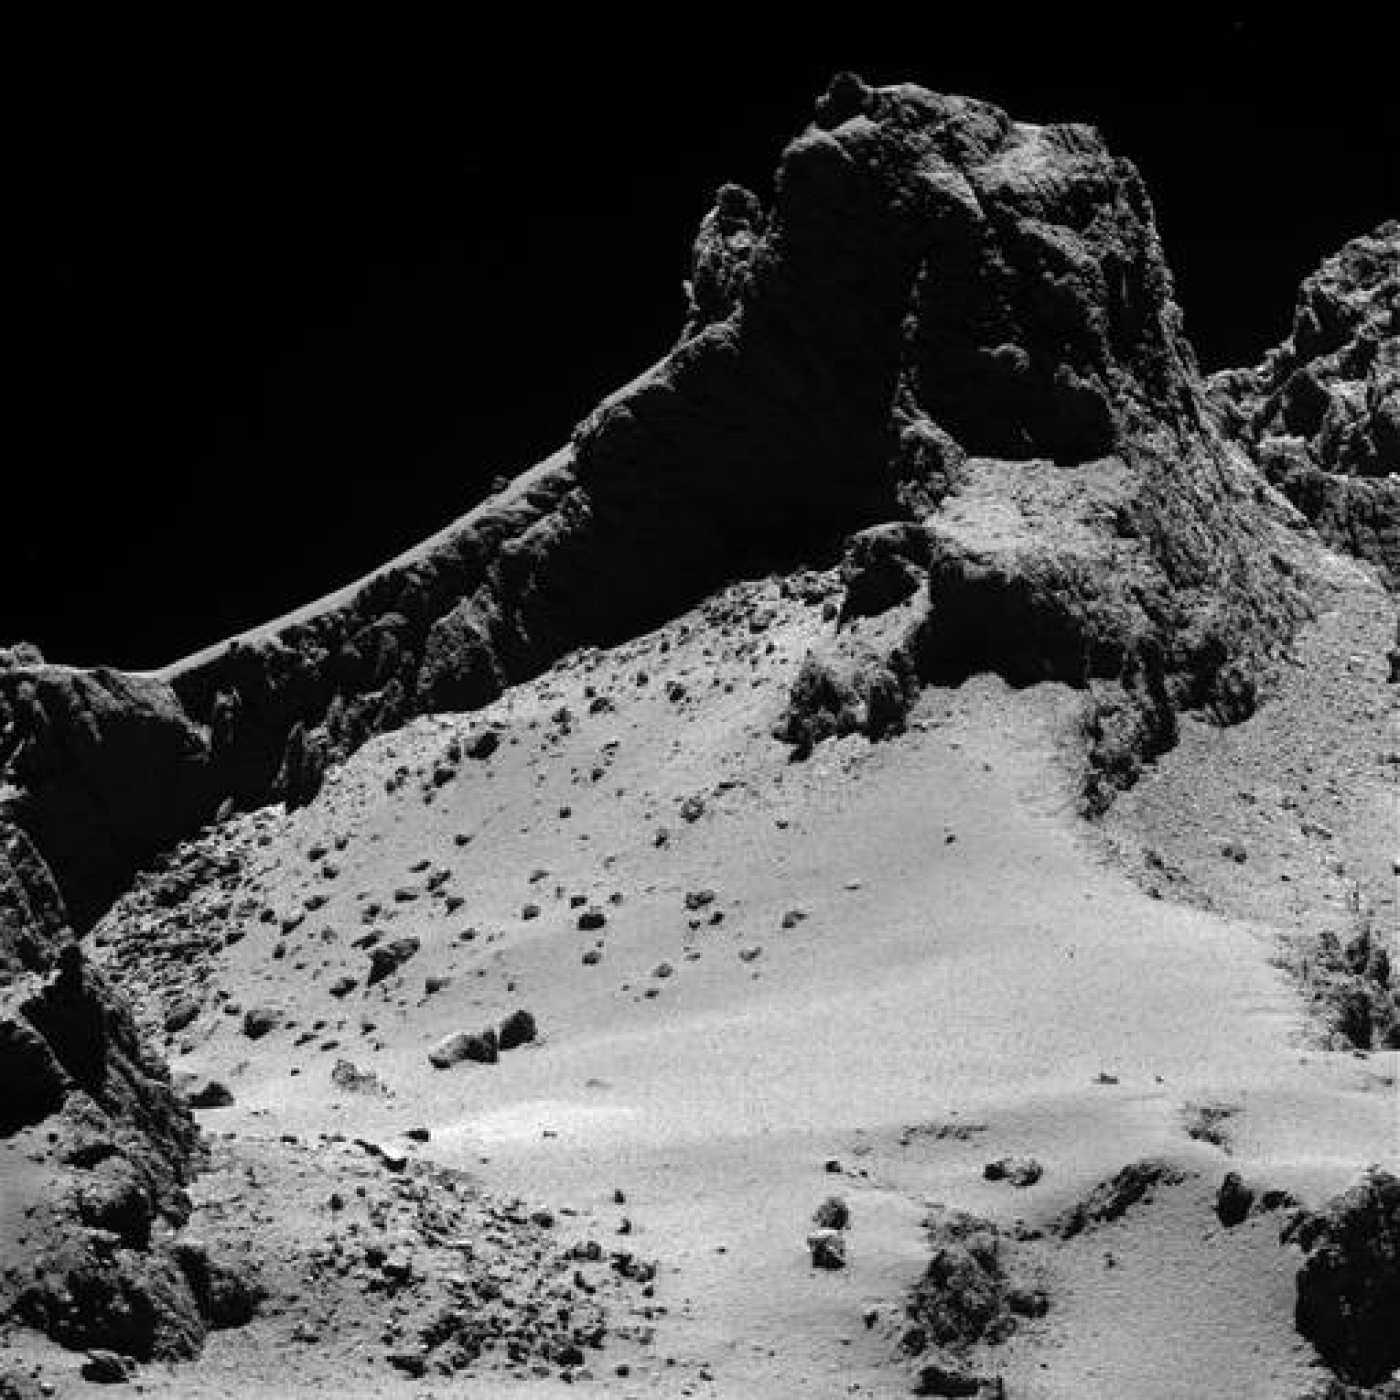 Imagen del cometa 67P/Churyumov-Gerasimenko obtenida a 8 kilómetros de distancia.